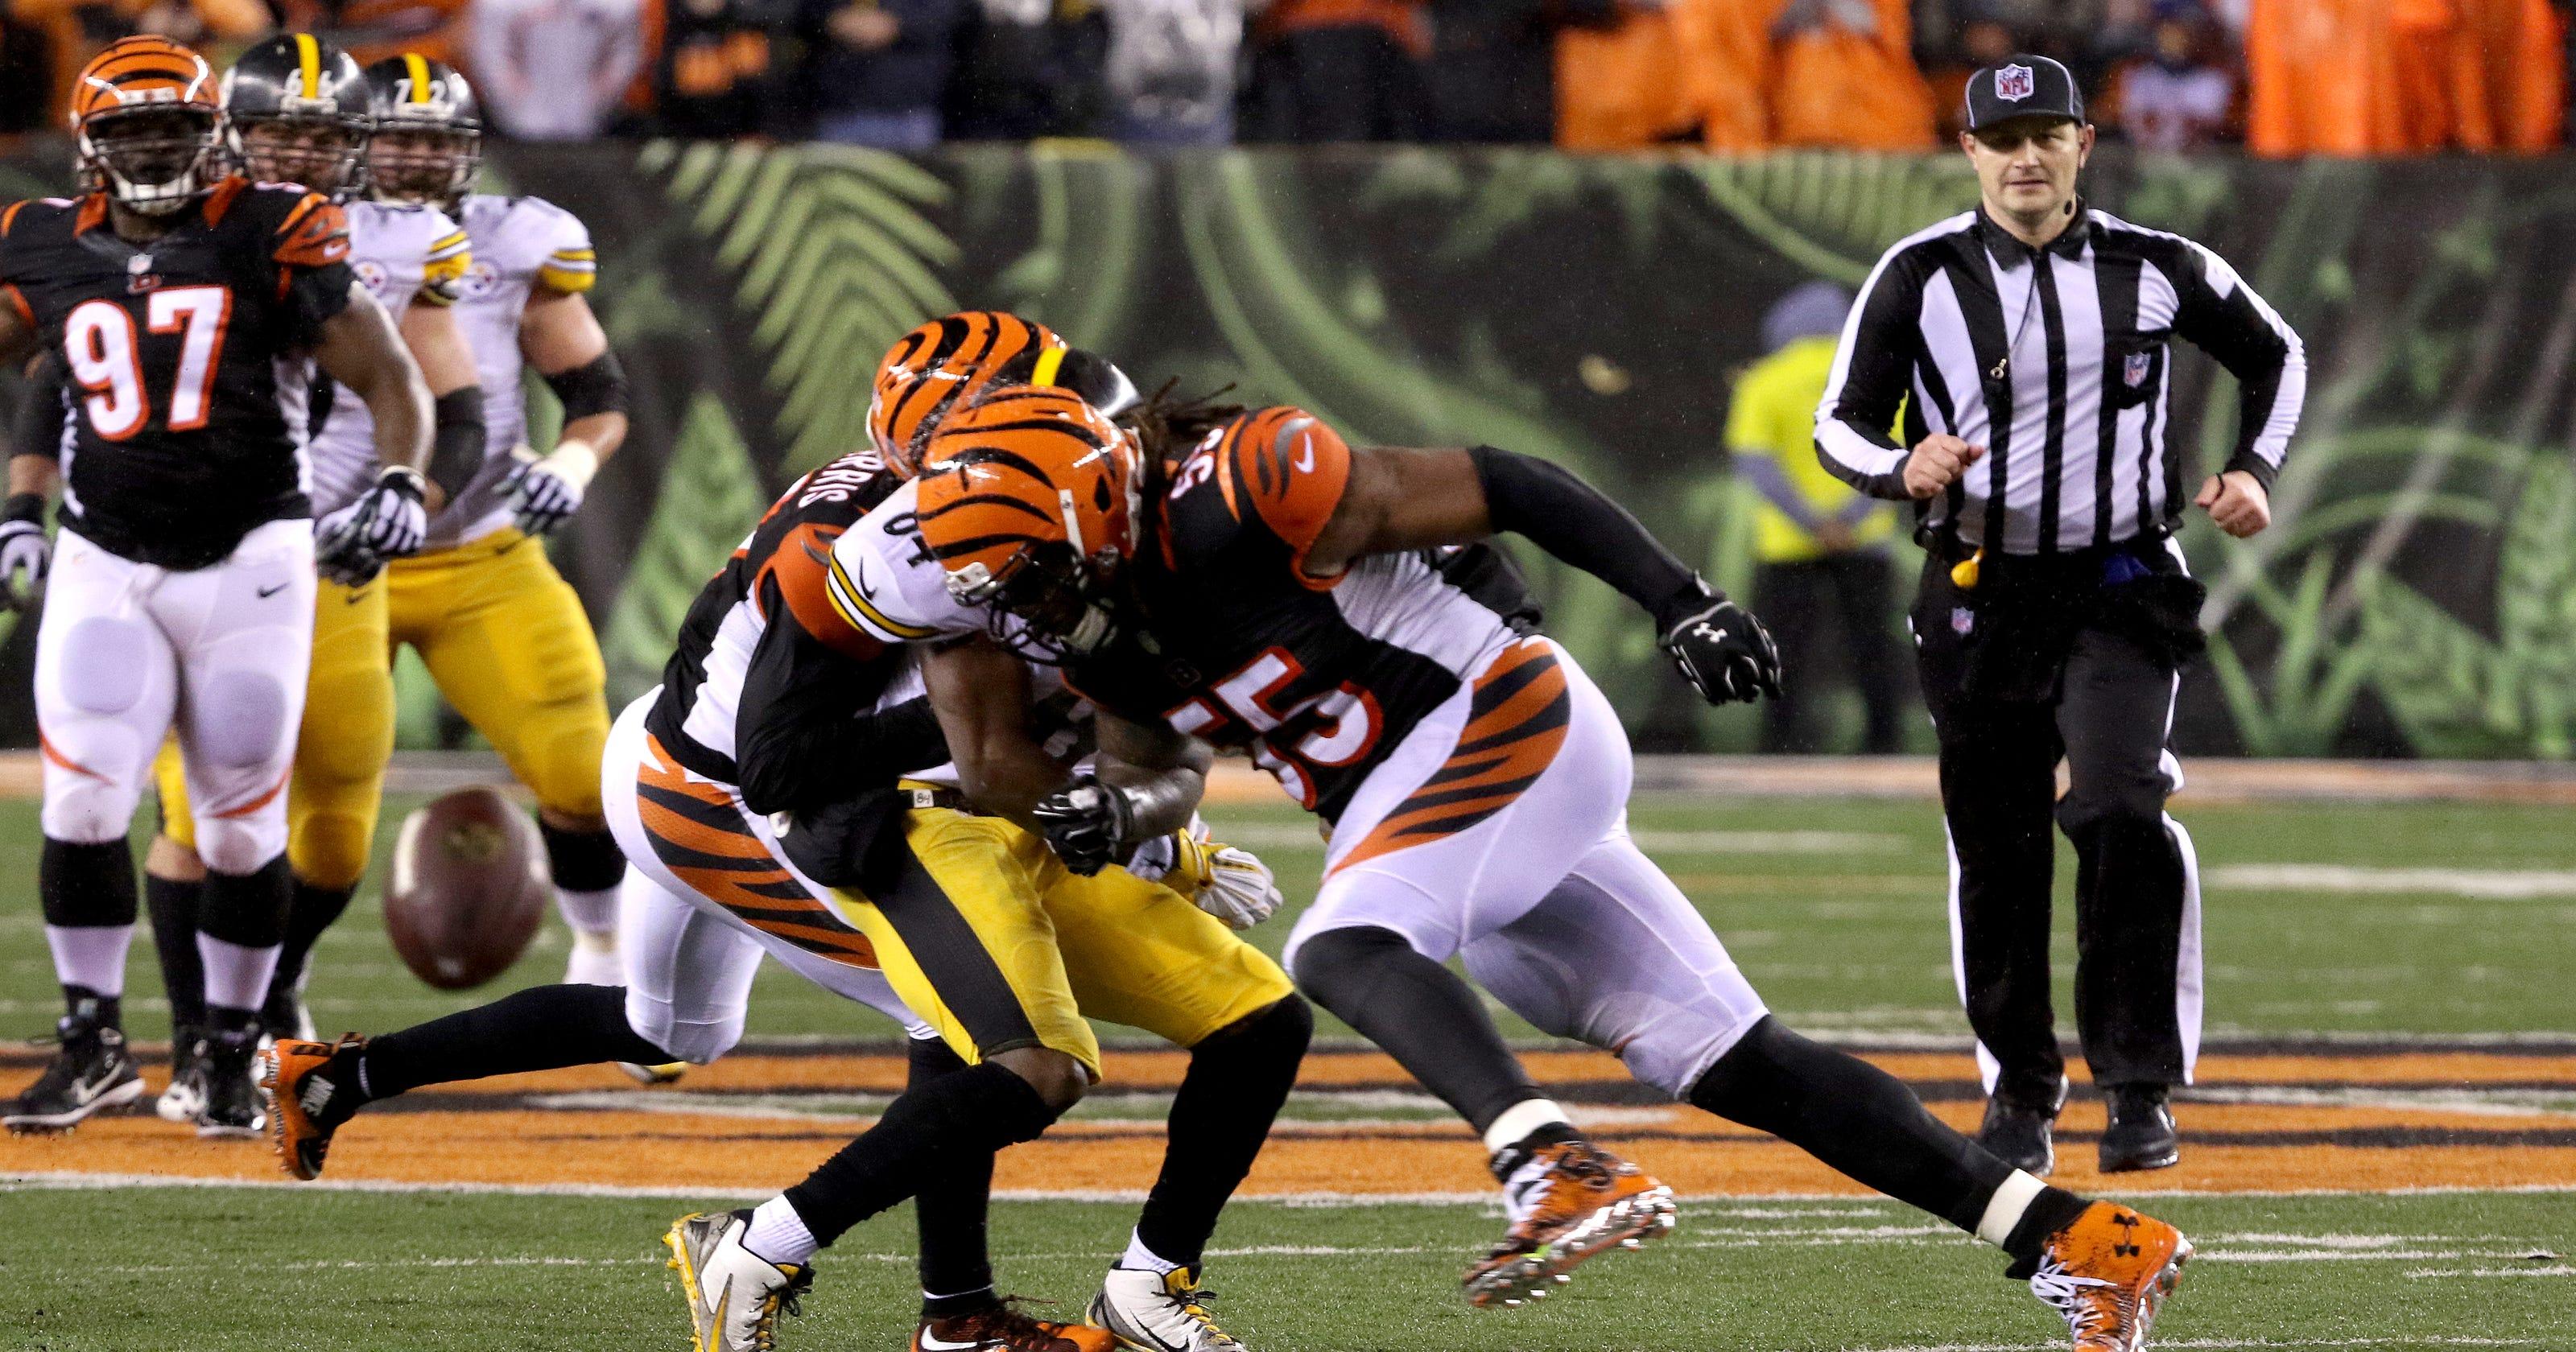 half off 8ea12 b0ded NFL suspends Vontaze Burfict for 'repeated violations'